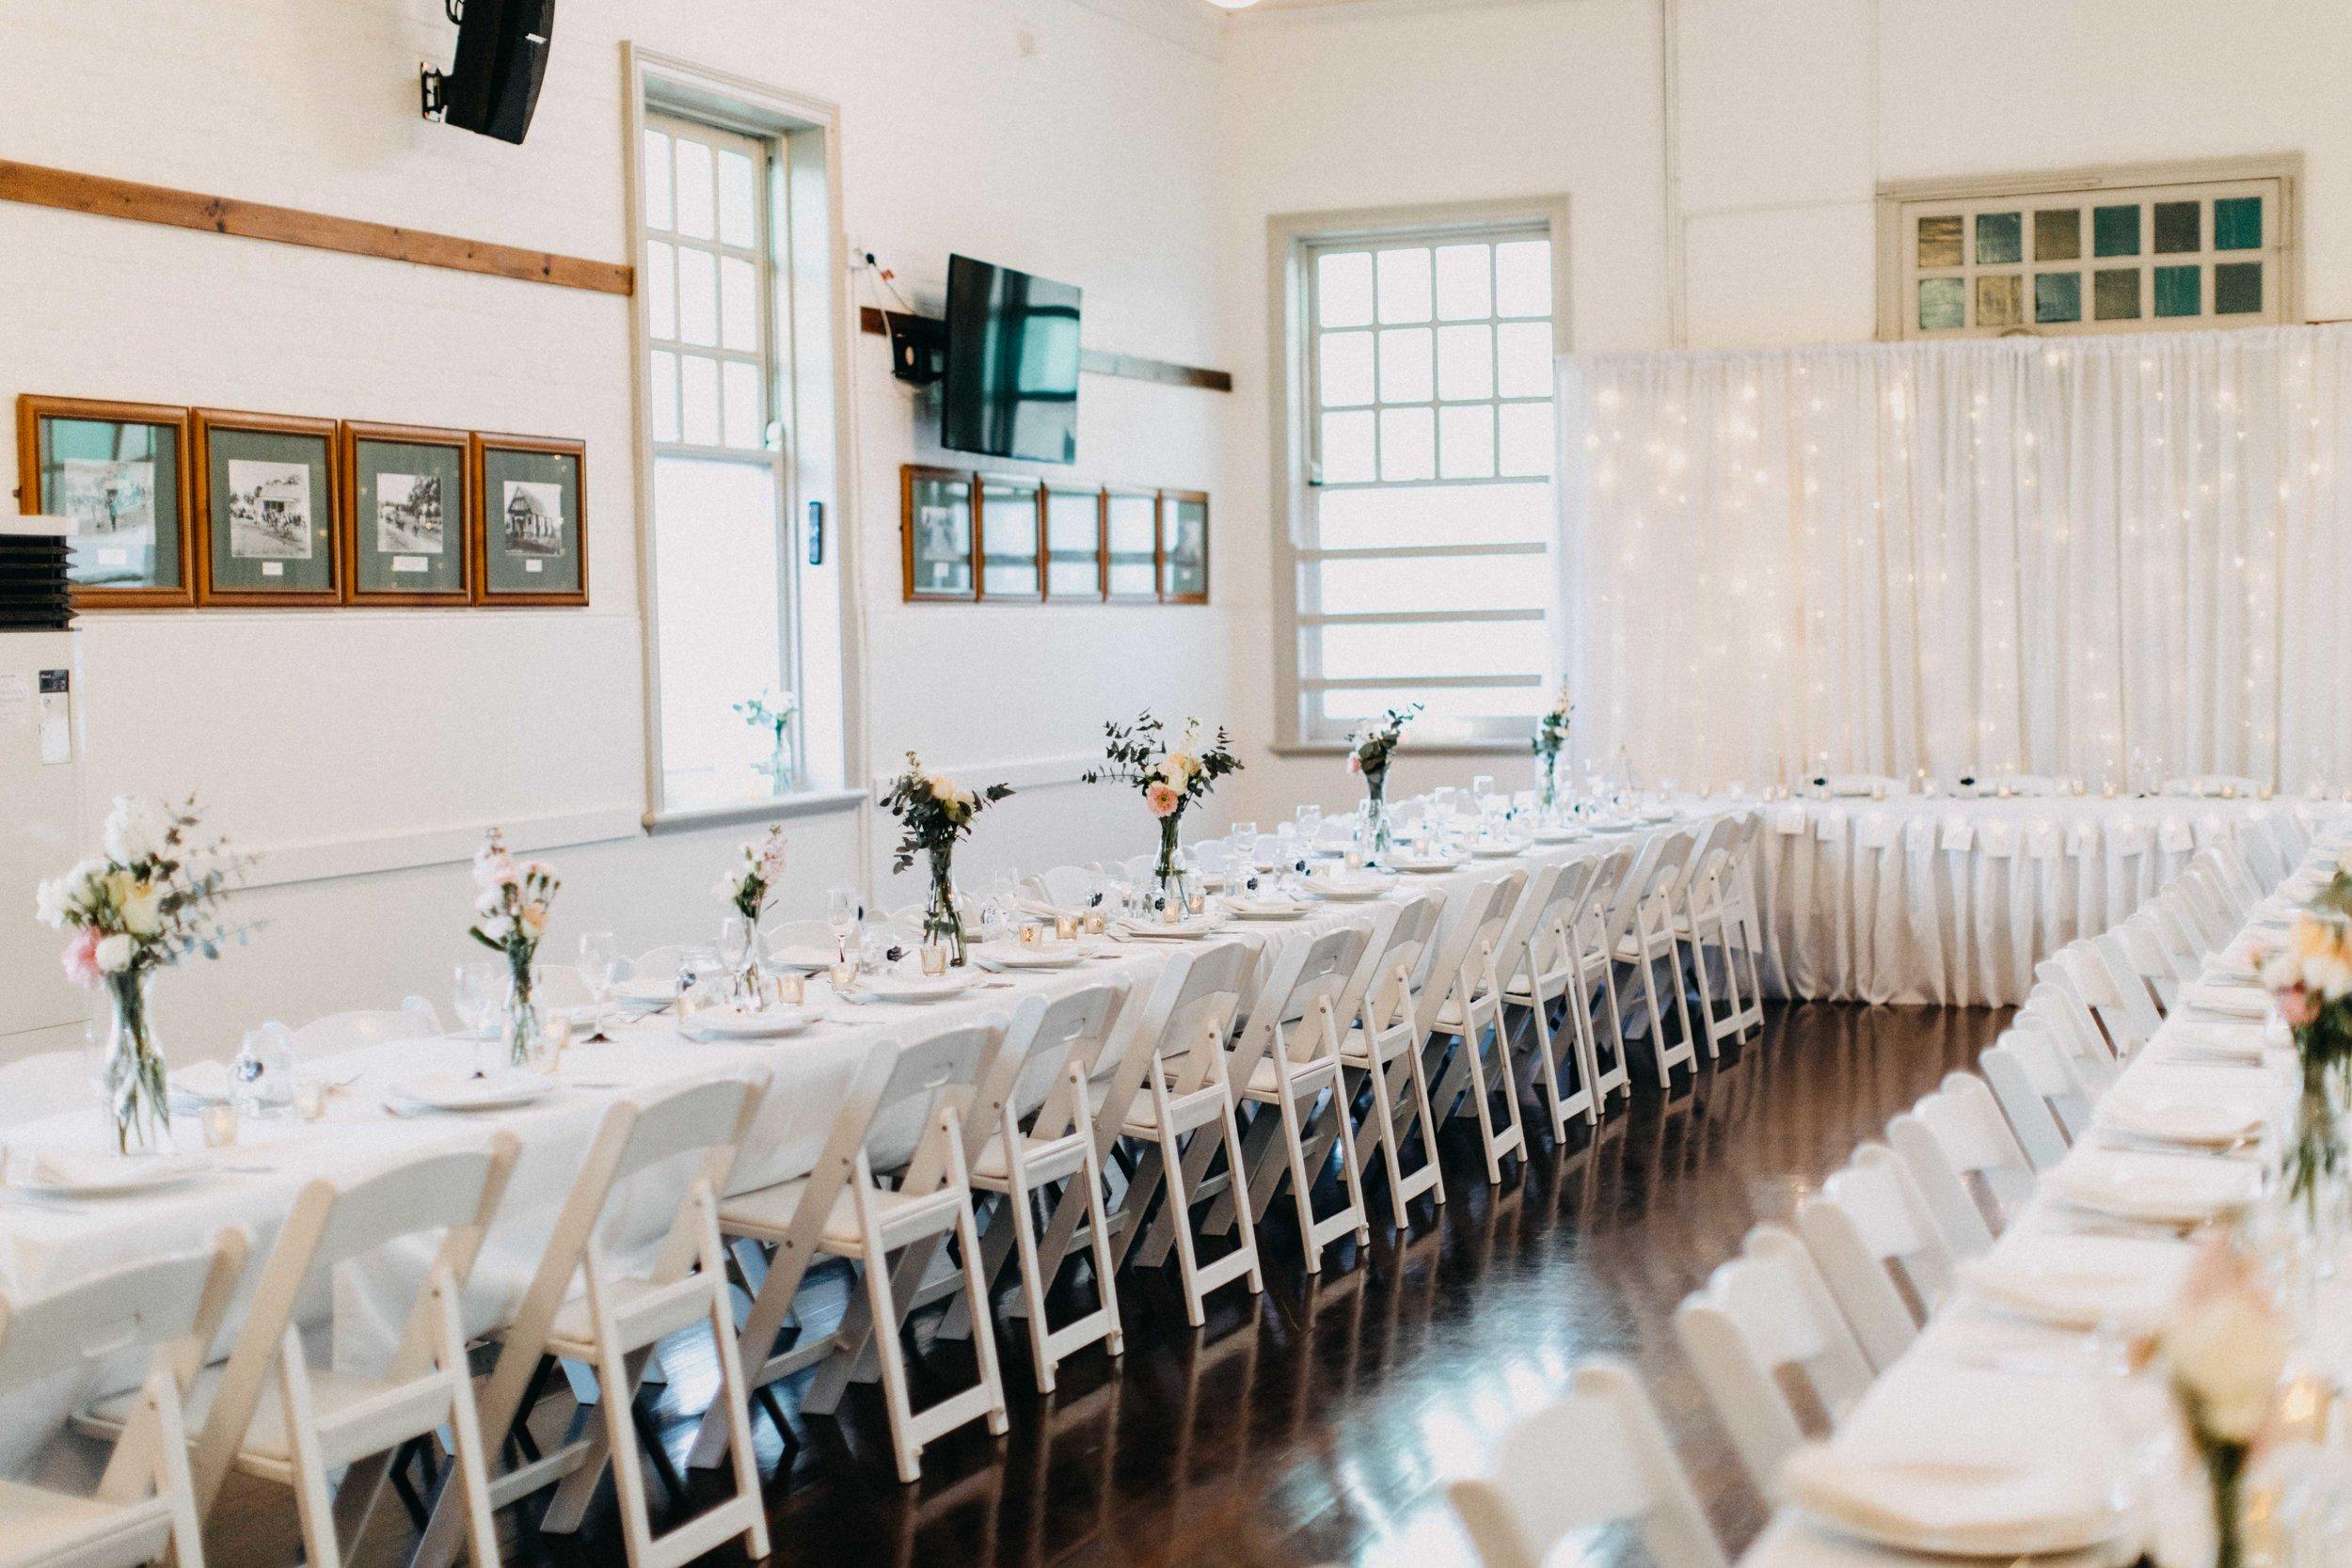 exeter-southern-highlands-wedding-www.emilyobrienphotography.net -125.jpg